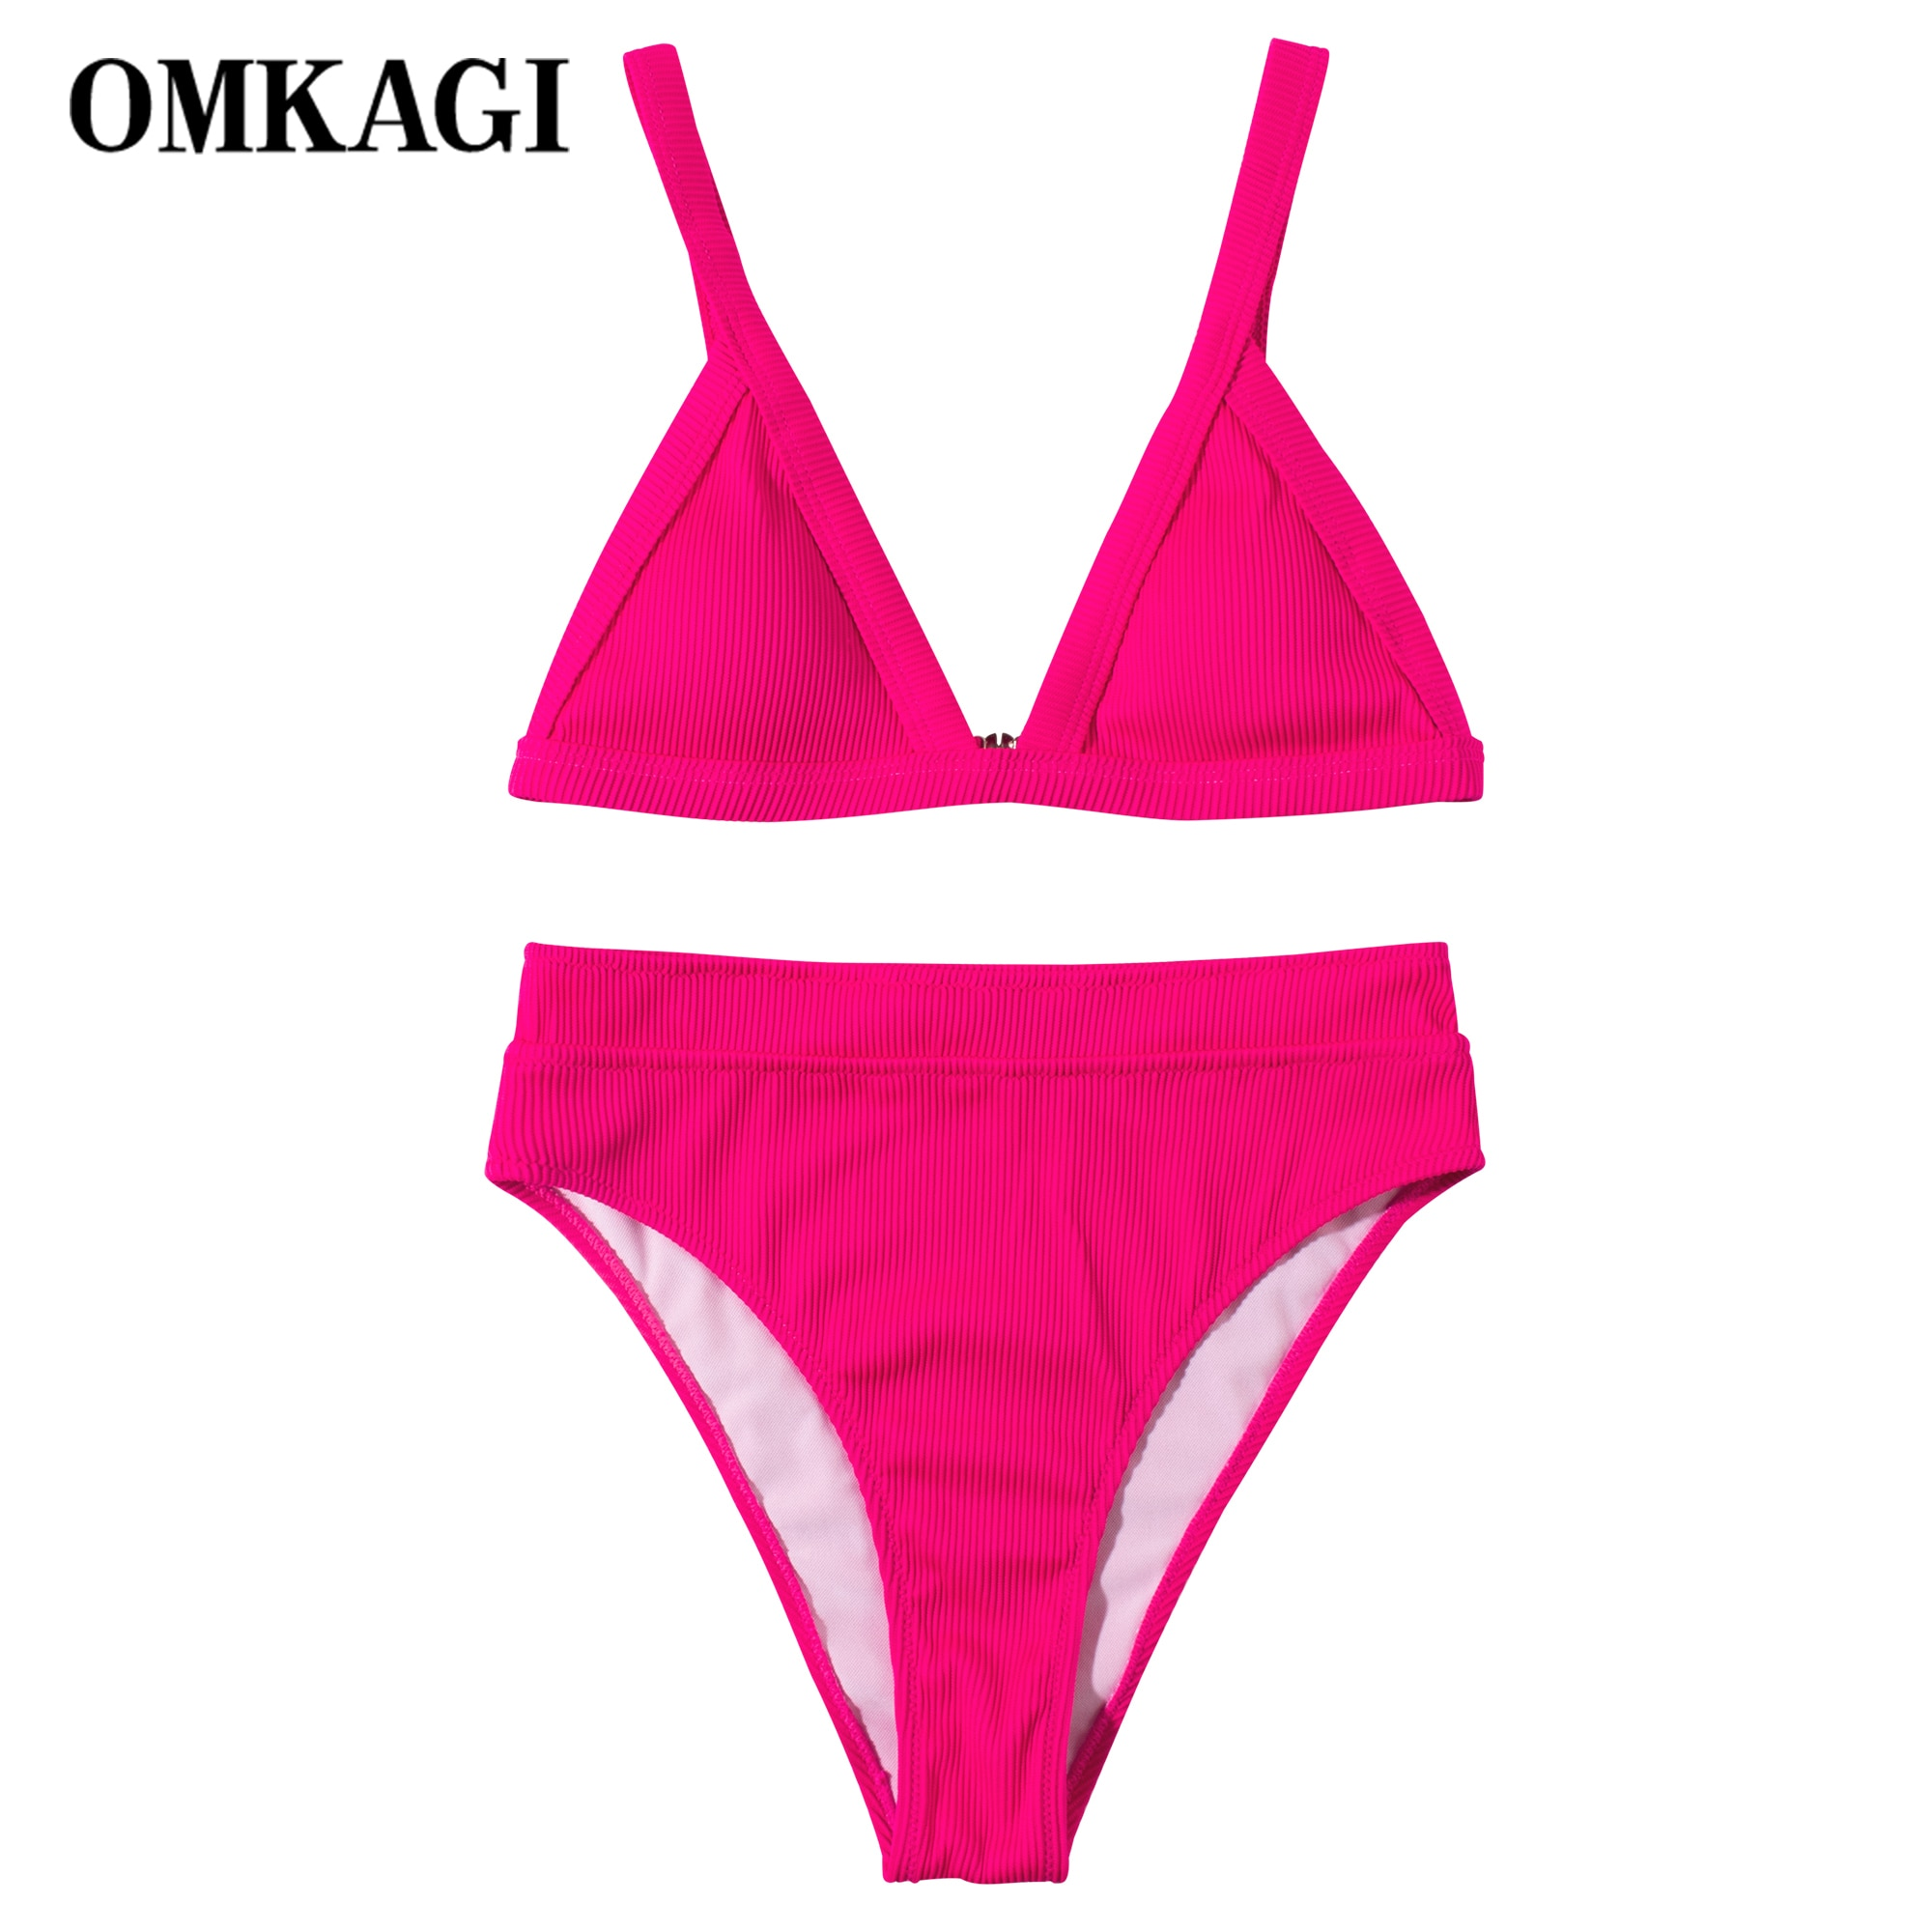 aliexpress.com - OMKAGI Bikini New Solid Swimwear Women Push Up Swimsuit 2021 High Waist Summer Bikini Set Beach Wear Biquini Swimsuit Female